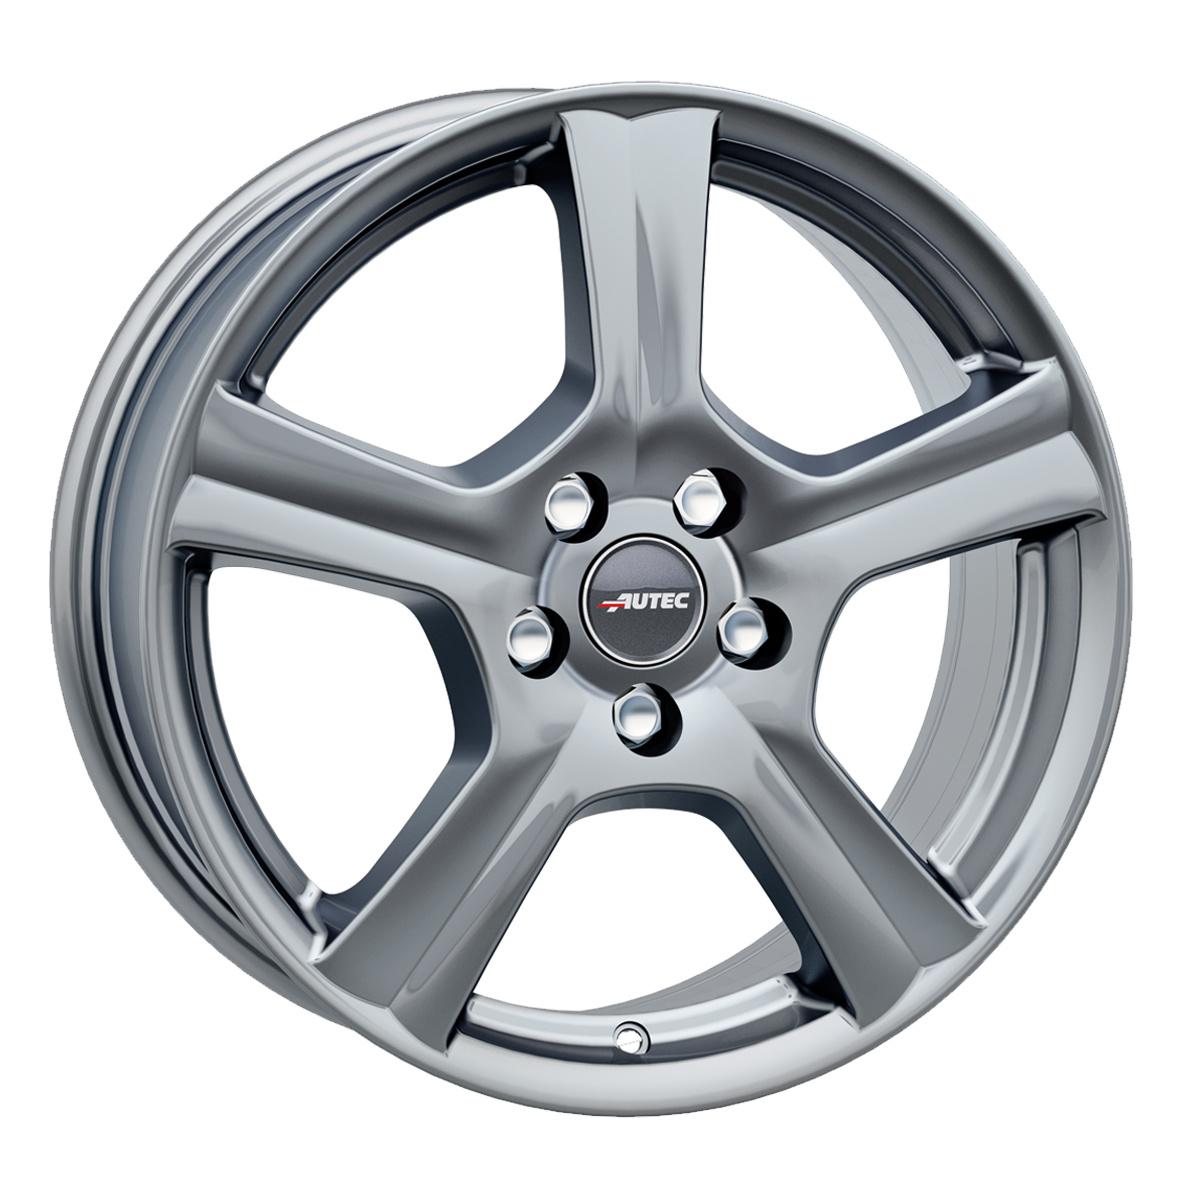 "Autec Wheels Autec  ""IONIK"" 6 x 15 - 7,5 x 18  Audi , Chevrolet , Citroen , Dacia , Honda , Hyundai , Kia , Mazda , MB , Mini ,"